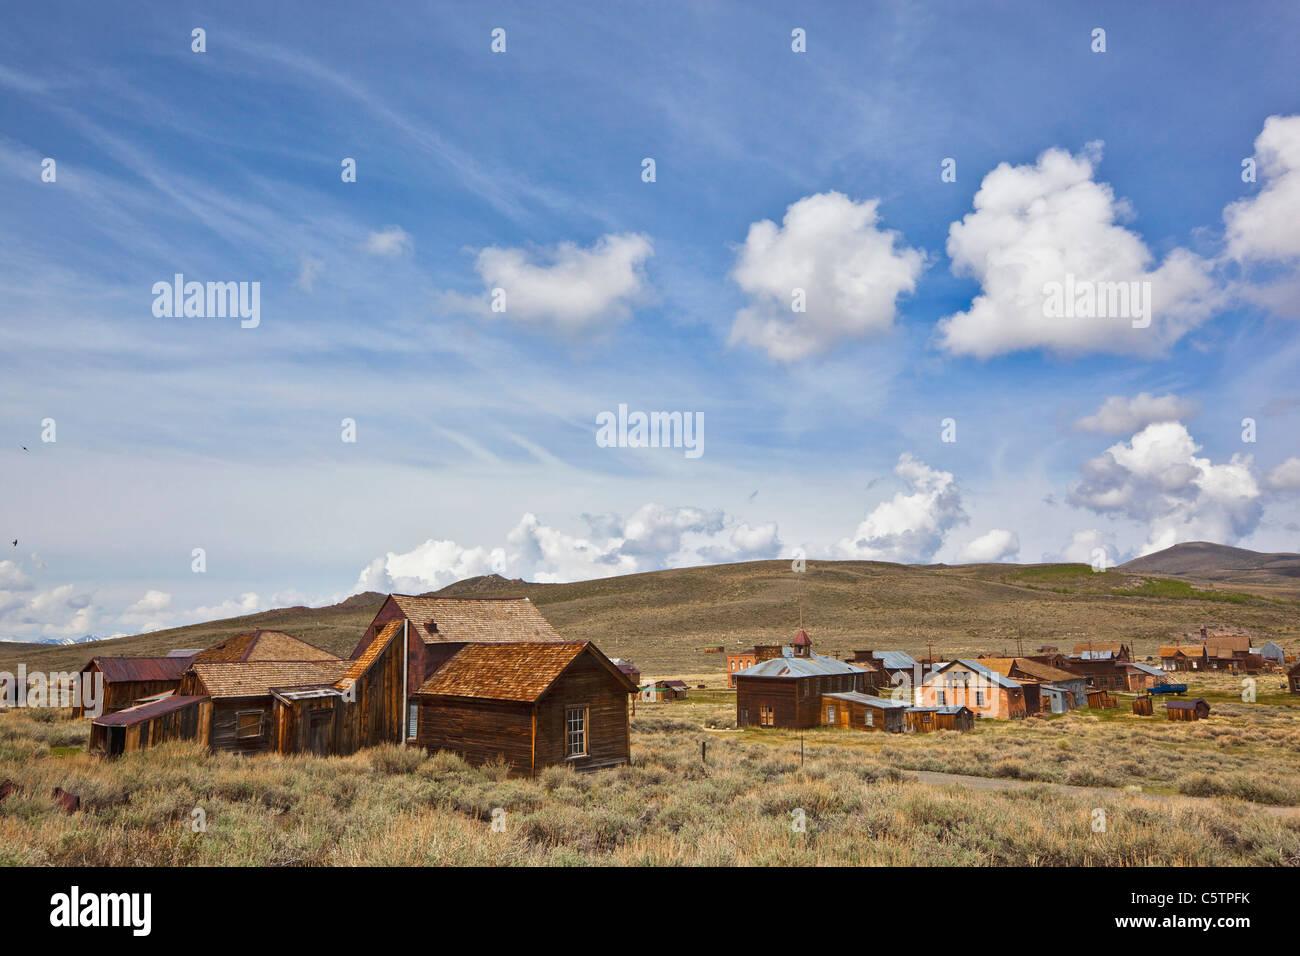 USA, California, Sierra Nevada, Bodie State Park - Stock Image